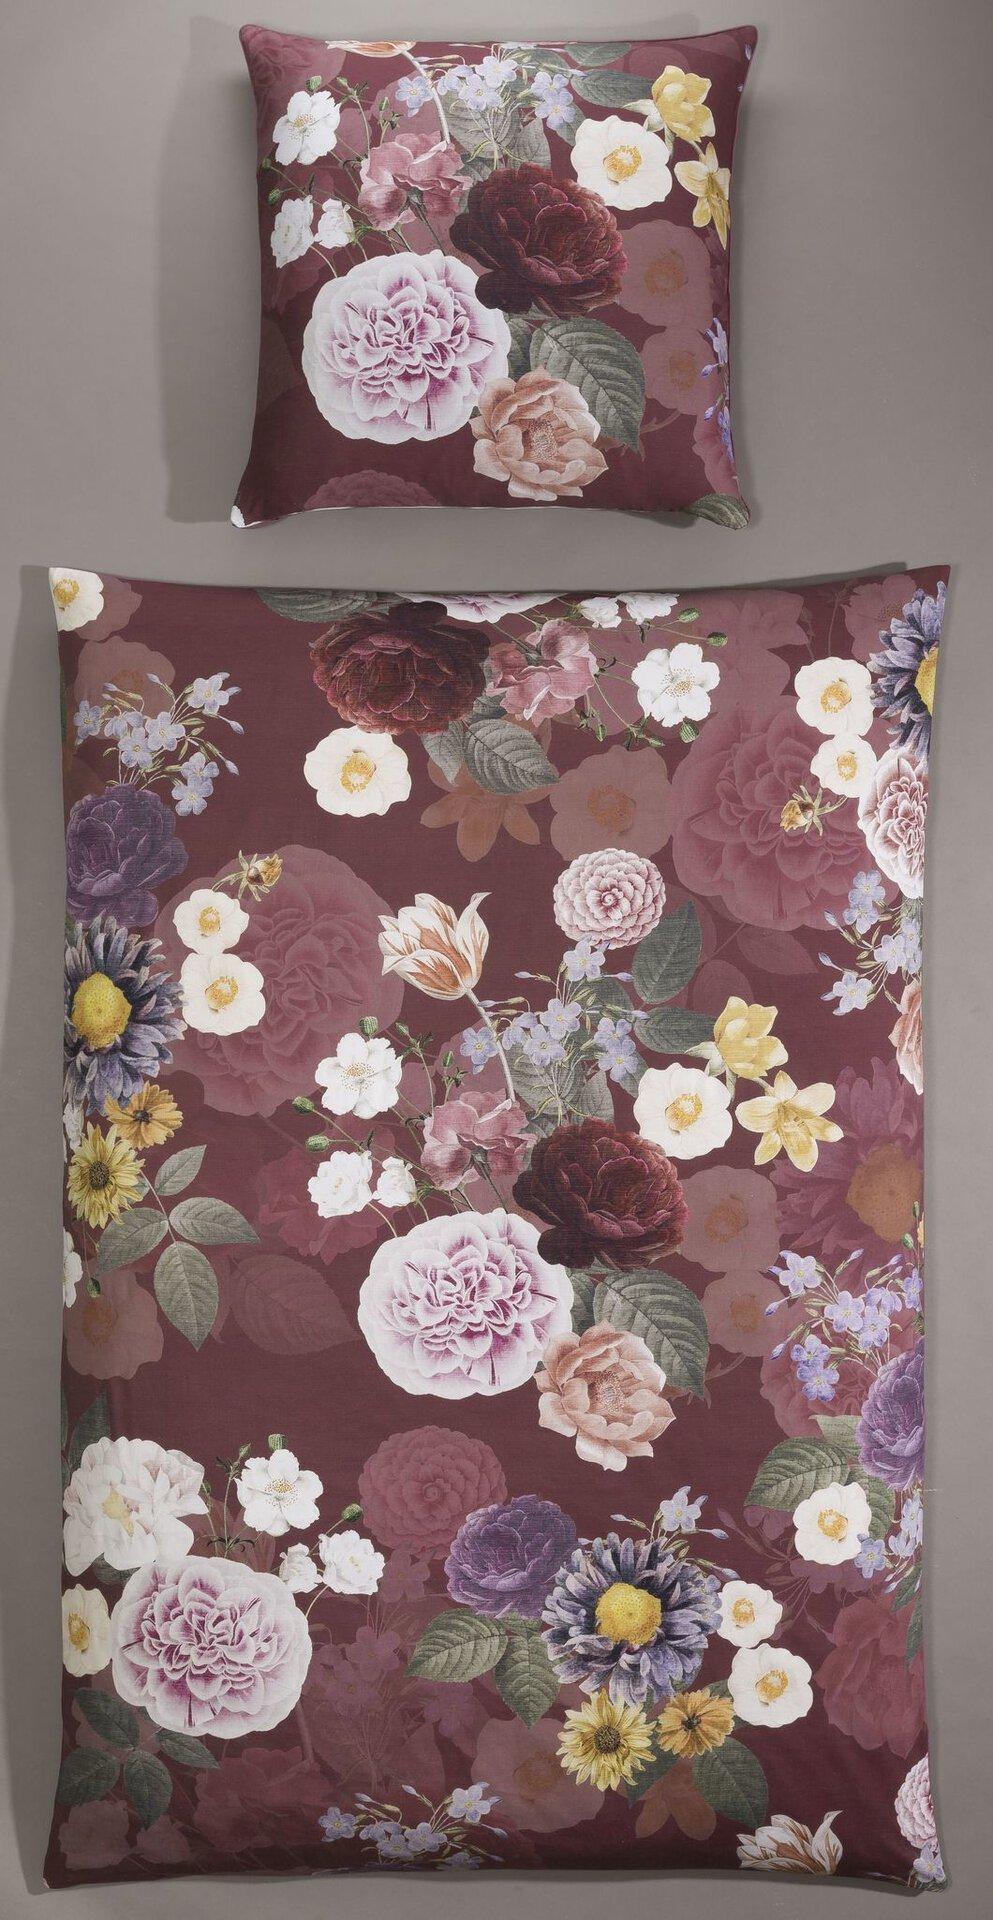 Satin-Bettwäsche Digital-Blumen Casa Nova Textil rot 155 x 220 cm